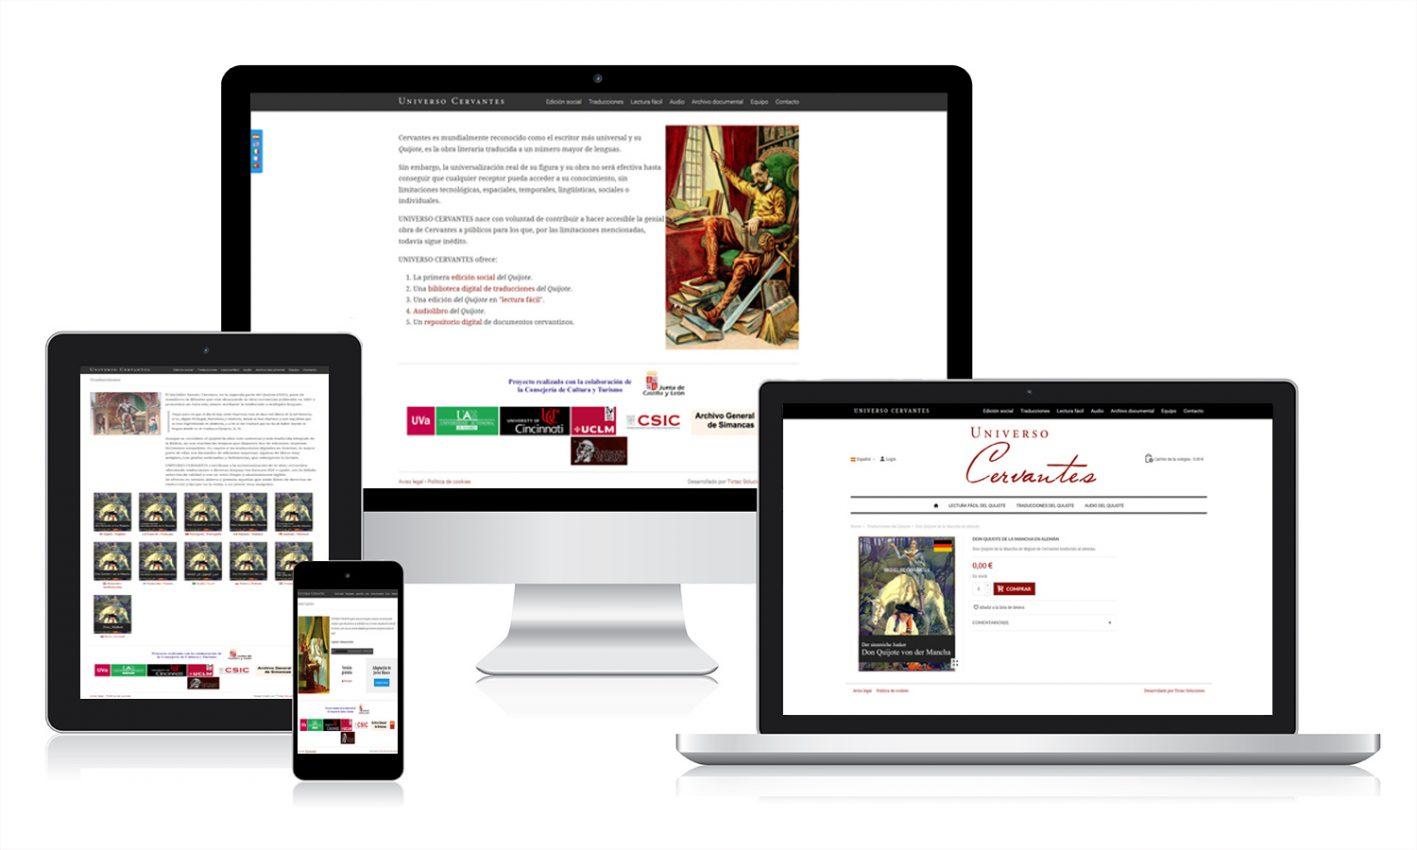 Diseño web para Universo Cervantes